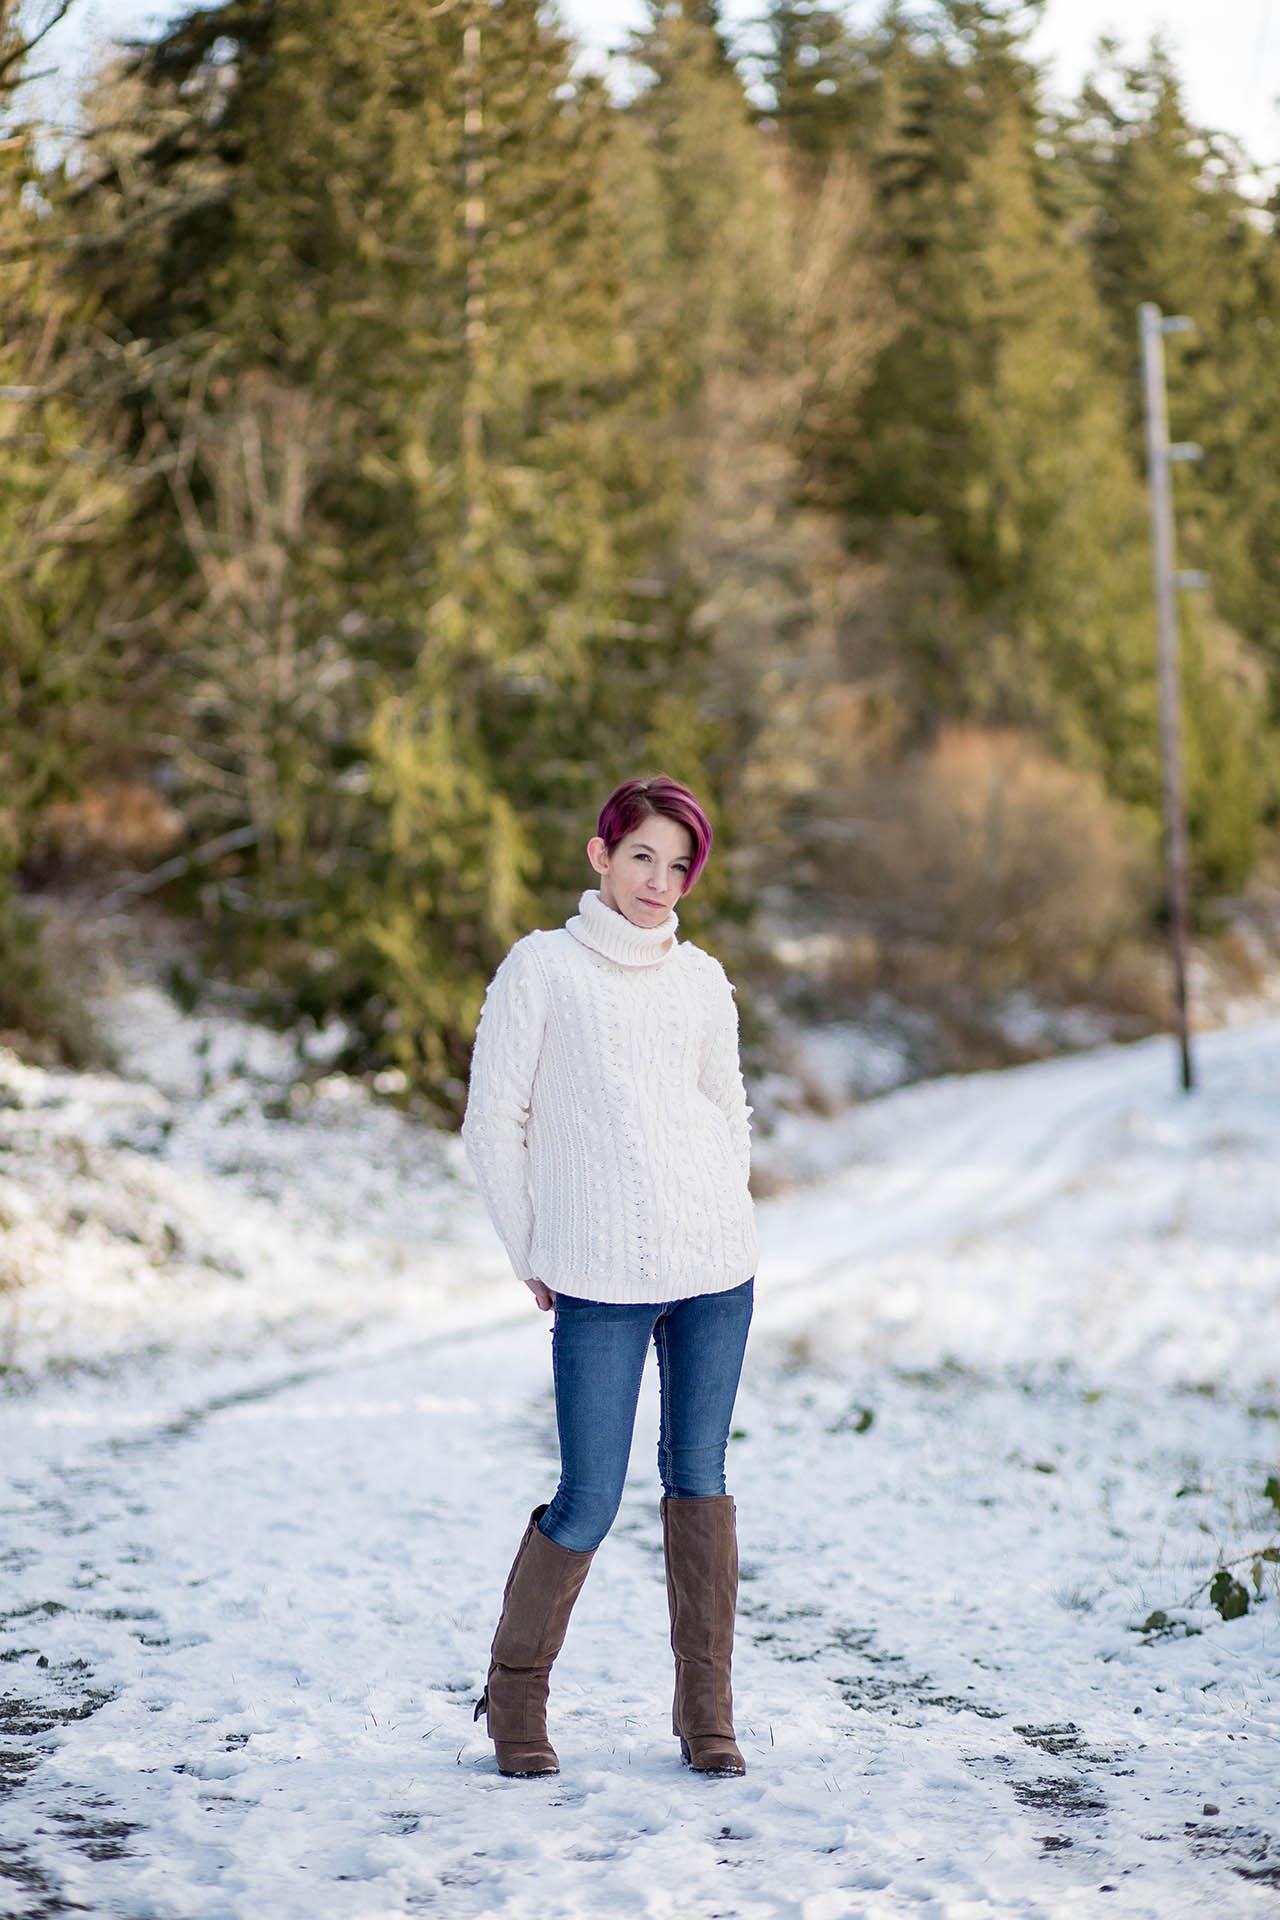 Seattle Professional business heashot photographers